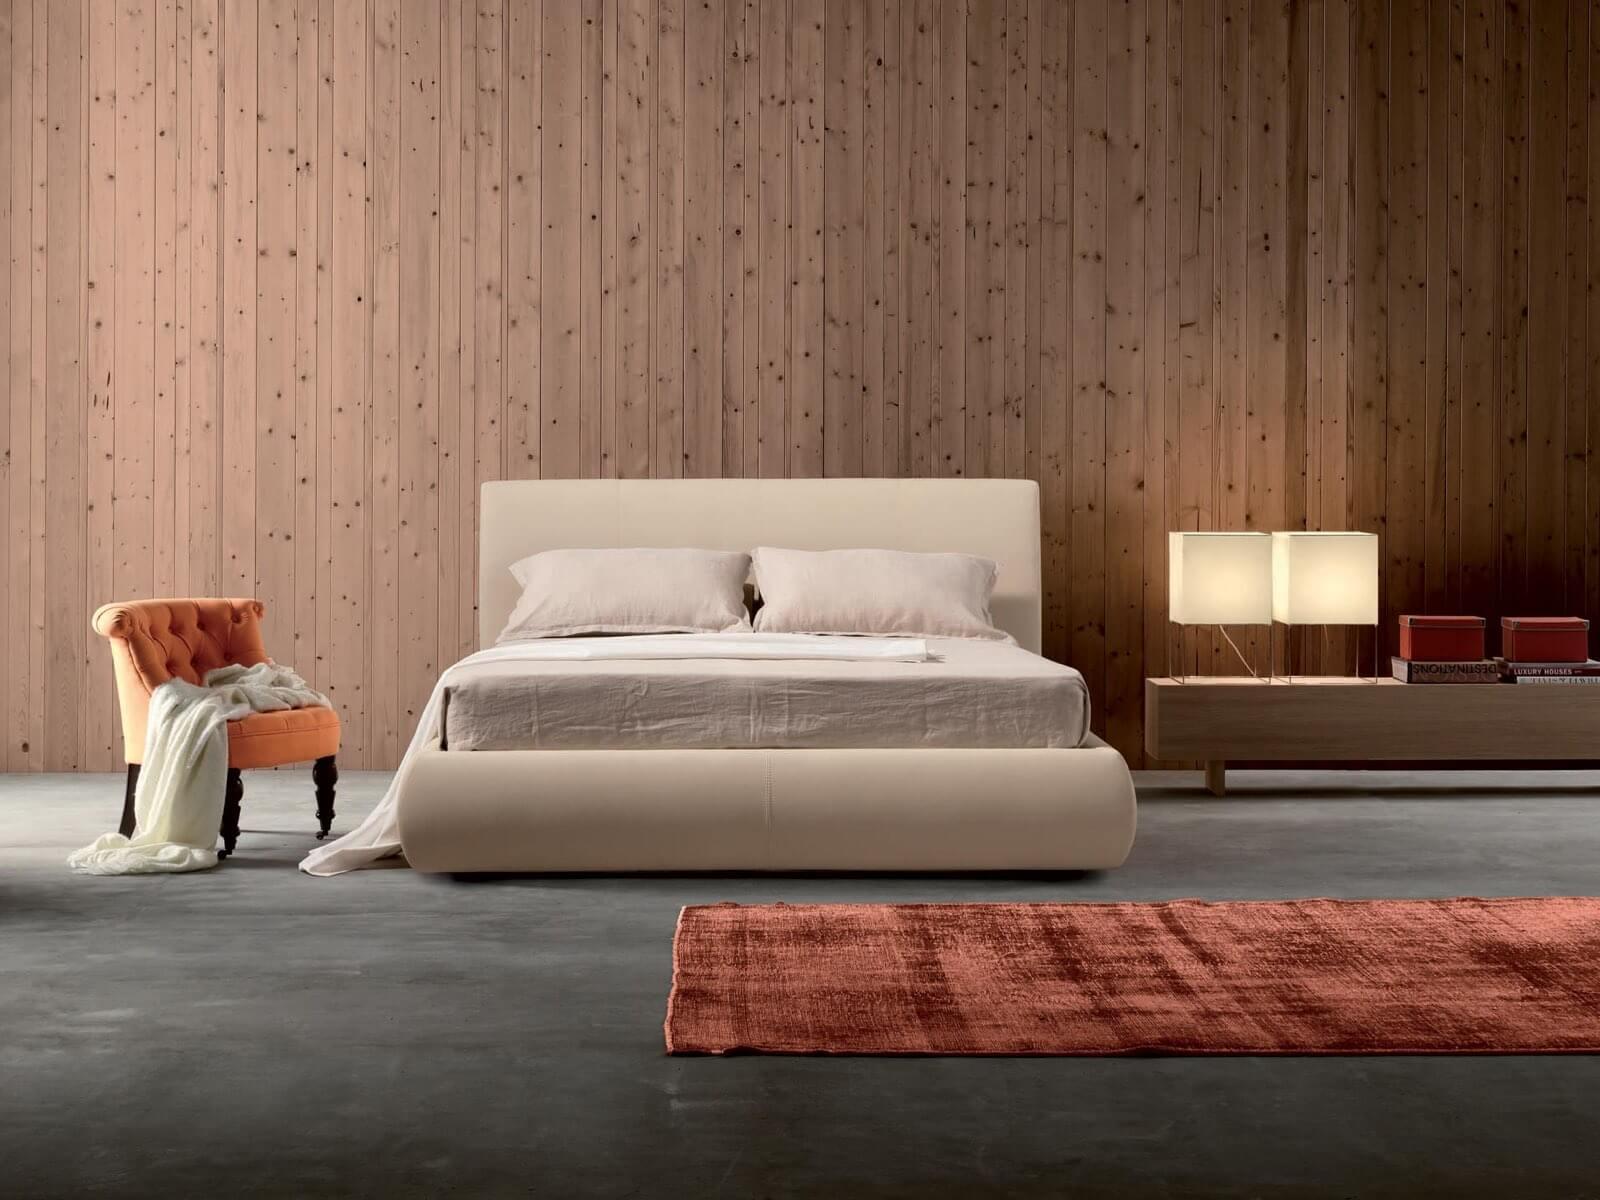 novaluna義大利進口床墊寢具